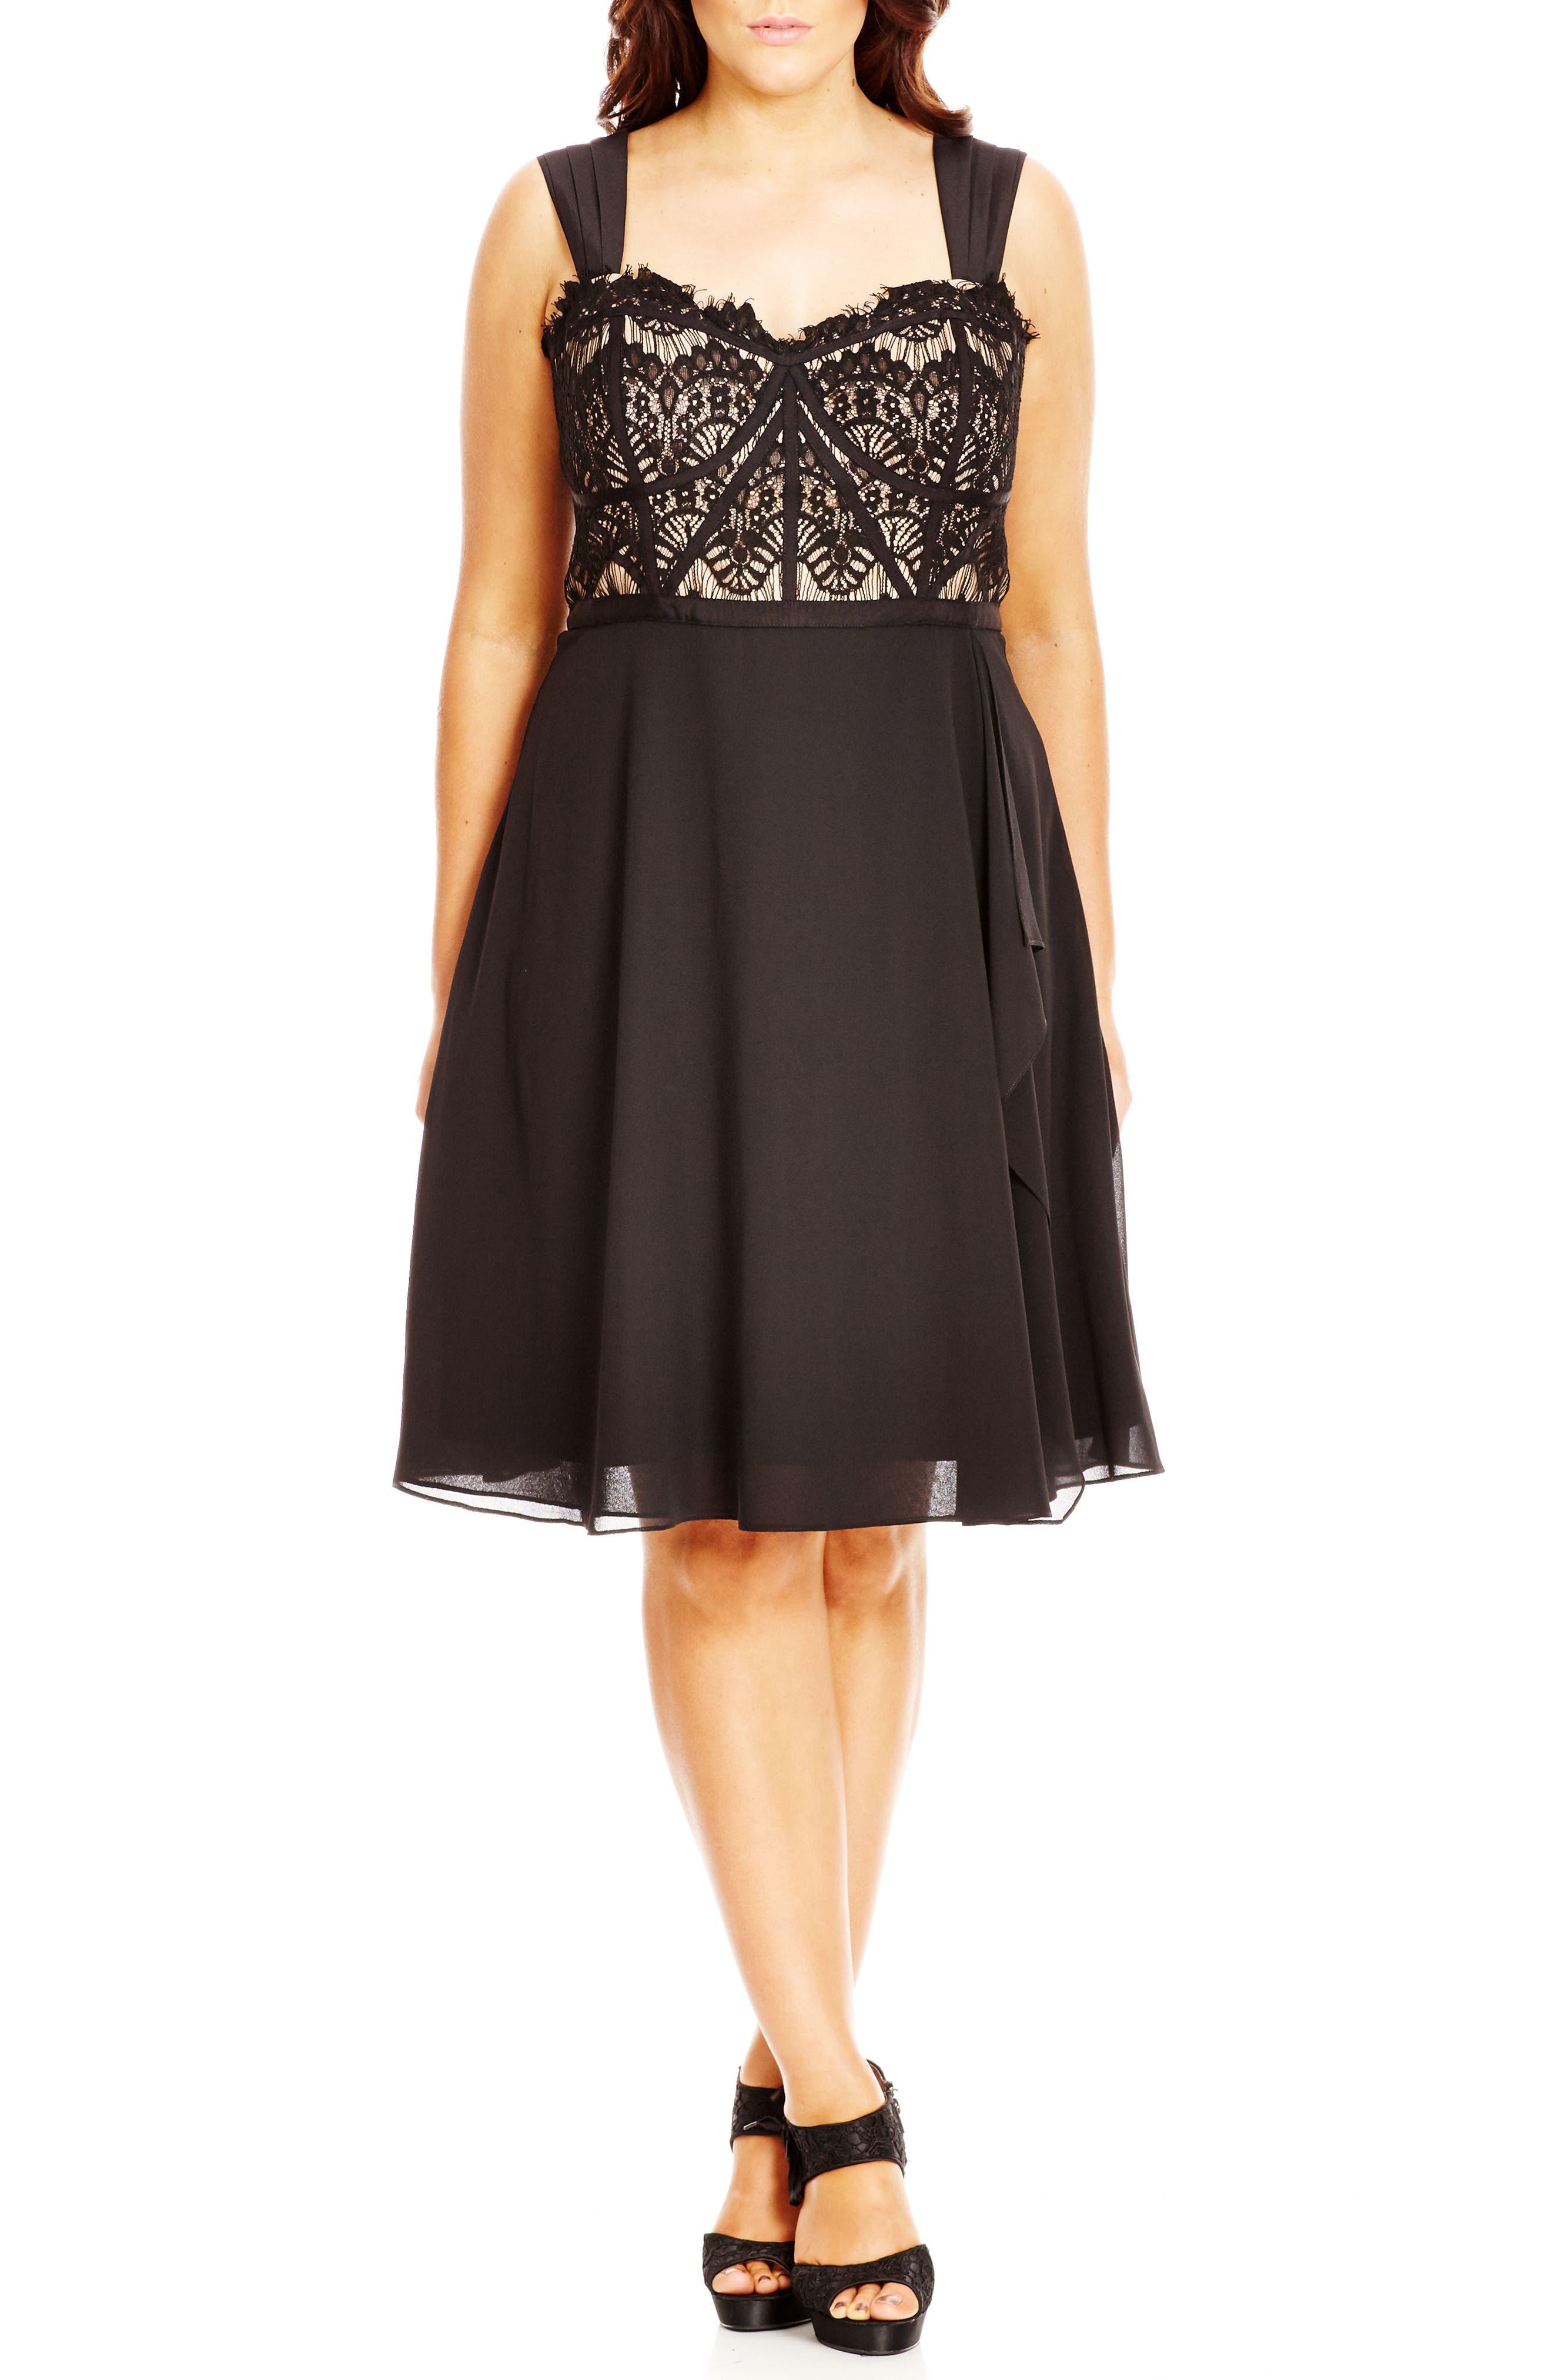 CITY CHIC, 'Eyelash Evie' Lace & Chiffon Cocktail Dress, Main thumbnail 1, color, BLACK